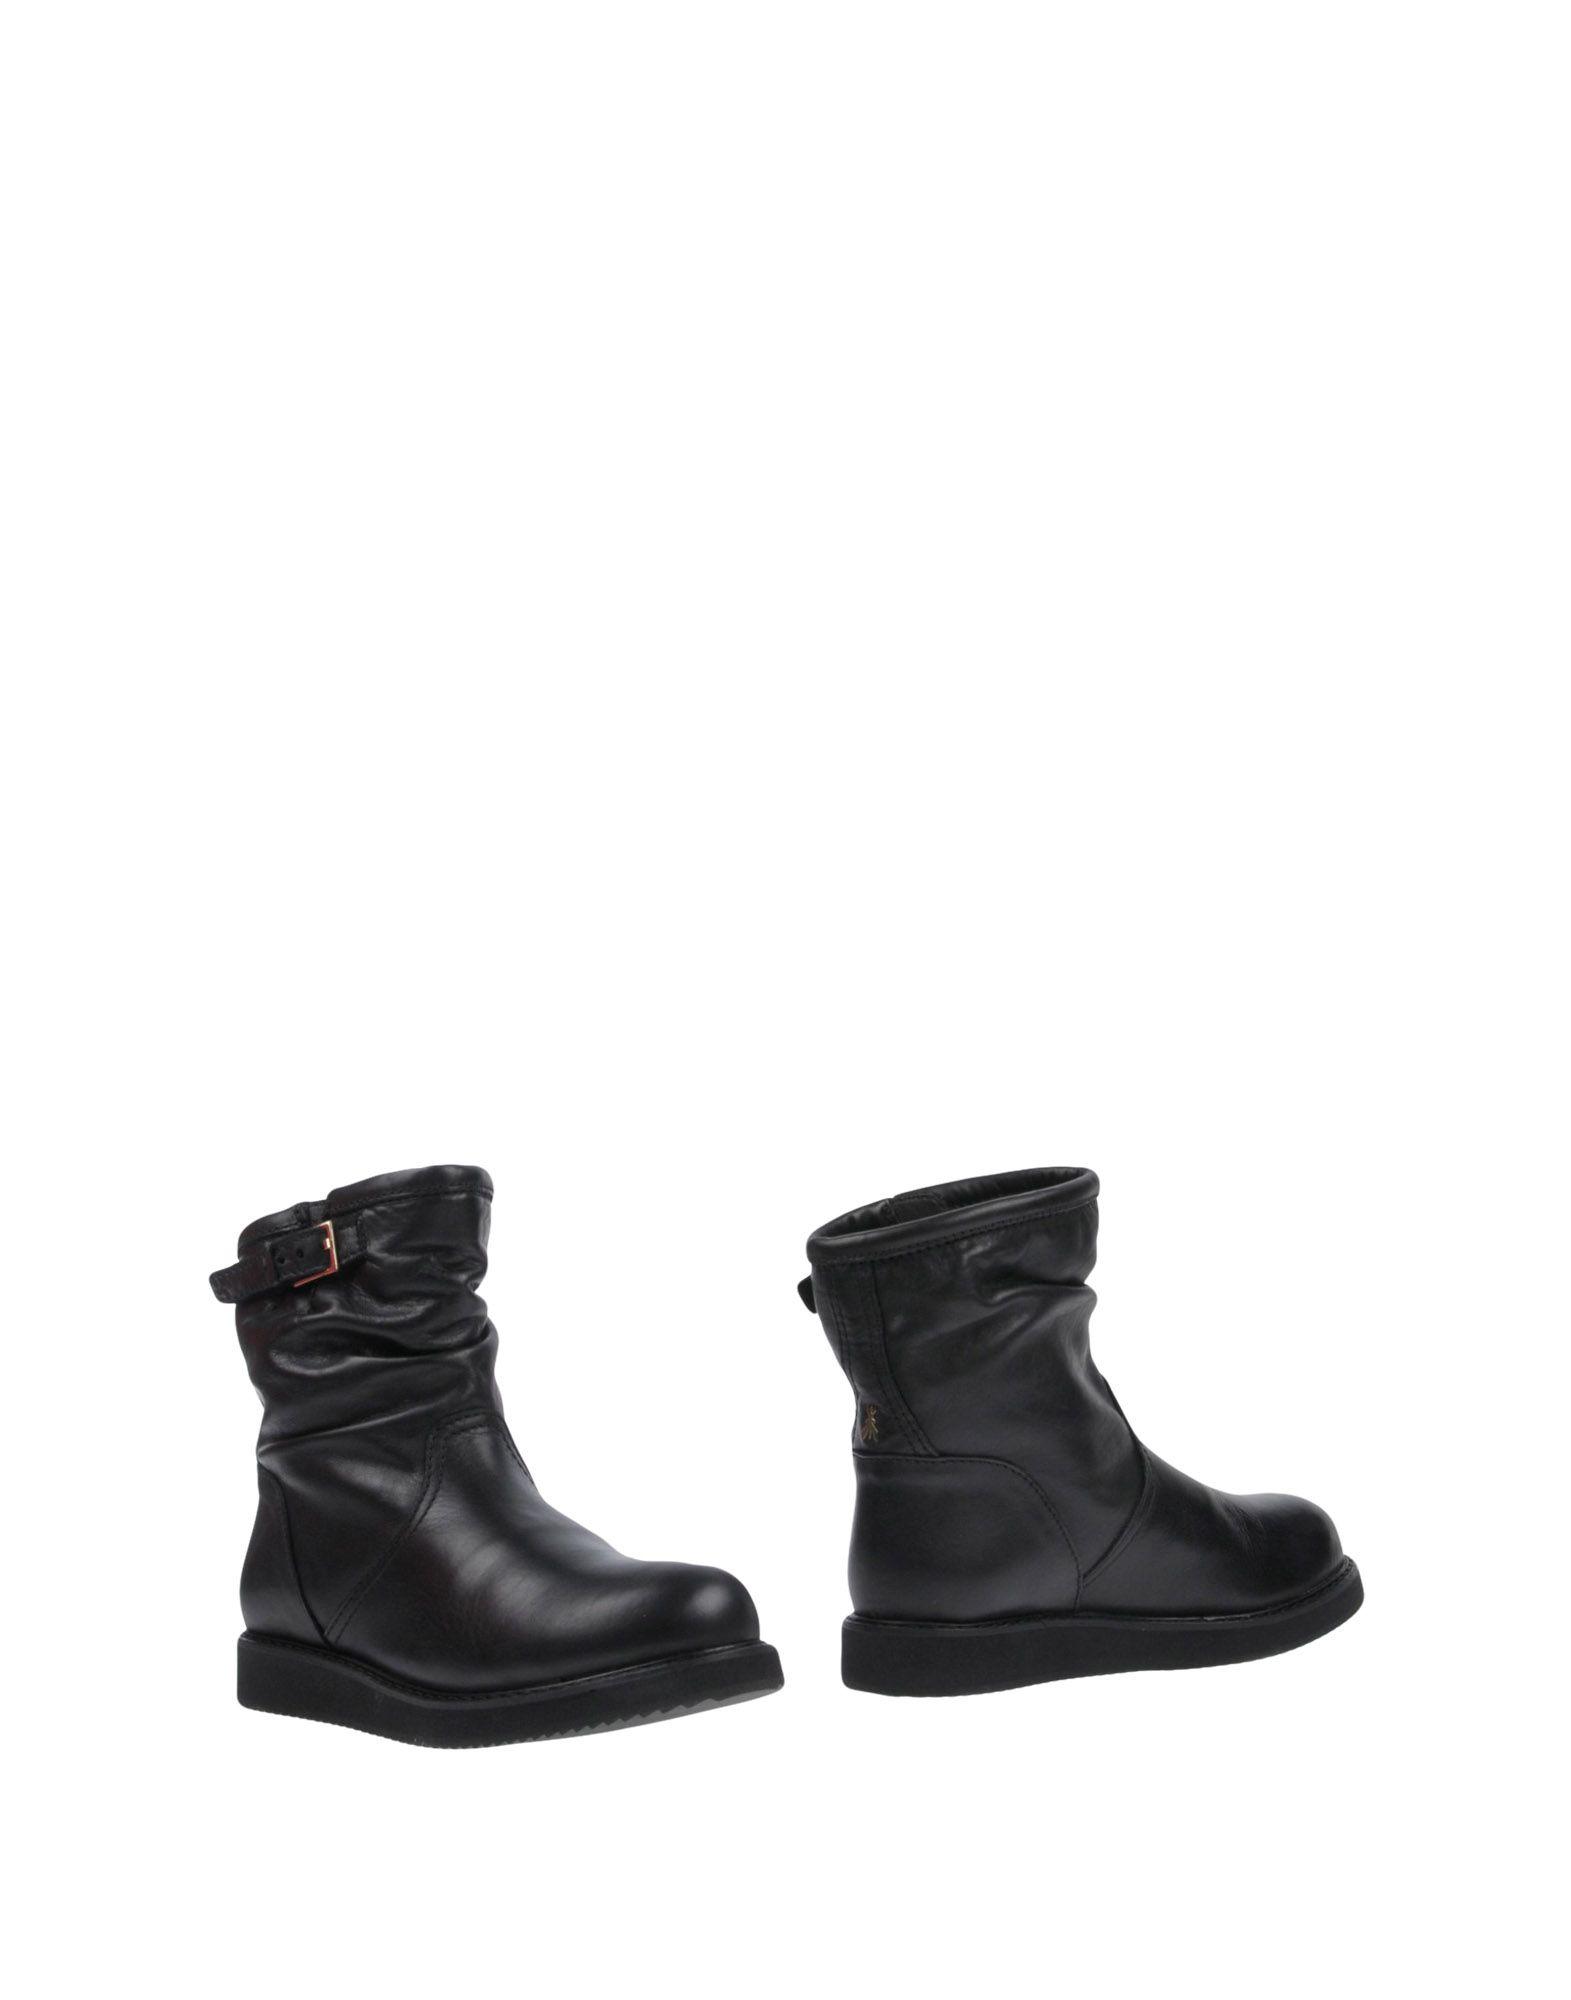 Patrizia Pepe Stiefelette Damen   Damen 11455220DJGut aussehende strapazierfähige Schuhe e85f74